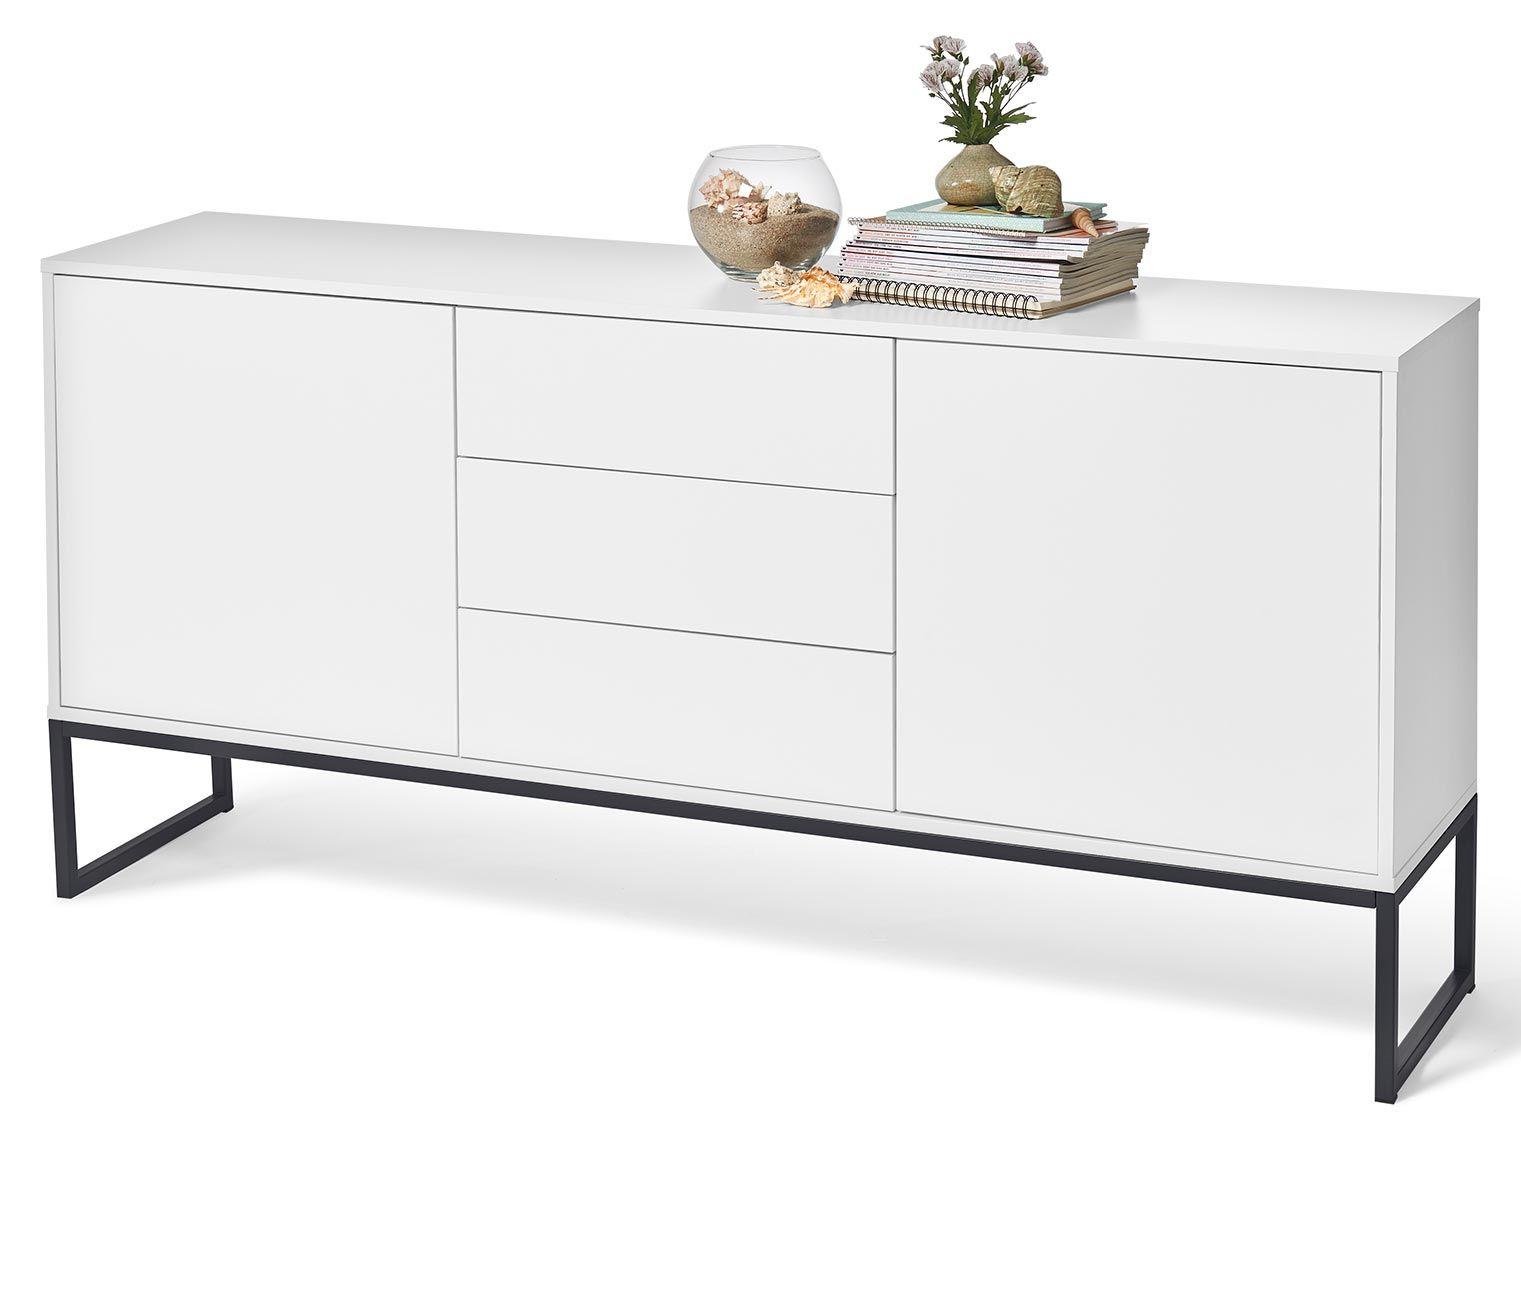 sideboard wei online bestellen bei tchibo 321800 sideboards pinterest sideboard weiss. Black Bedroom Furniture Sets. Home Design Ideas